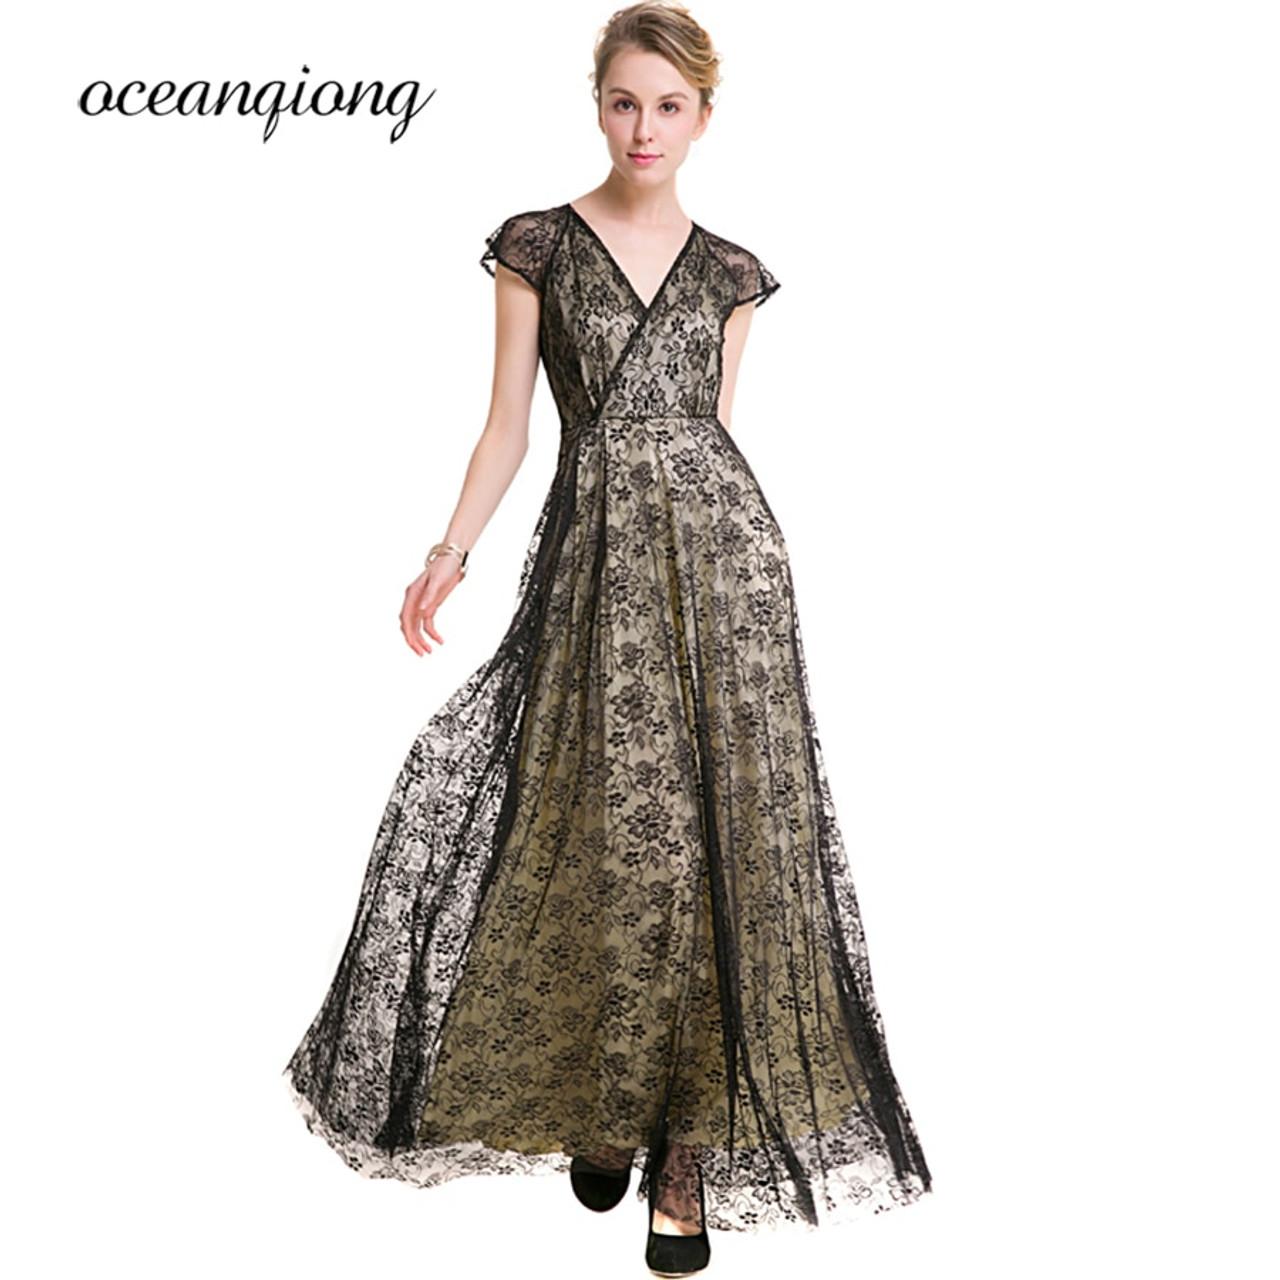 91013d8428509 New Fashion Party Dress Maxi 2018 Spring Summer Sexy V Neck Long Lace Dress  Vintage Women Party Dress Big Size Female Vestidos